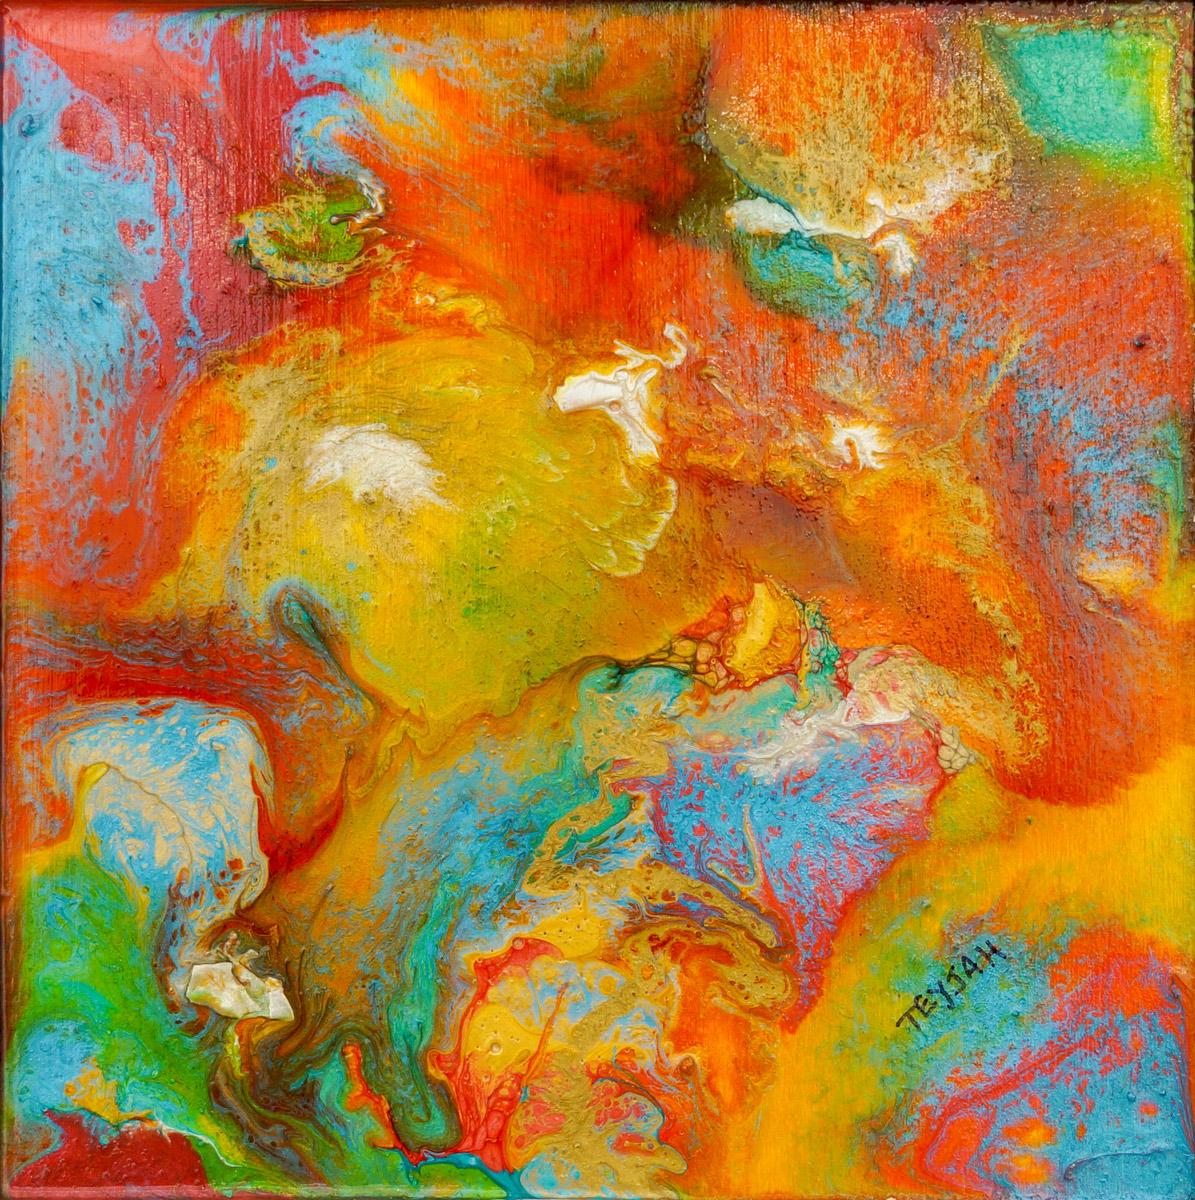 Posy Oil Painting by teyjah